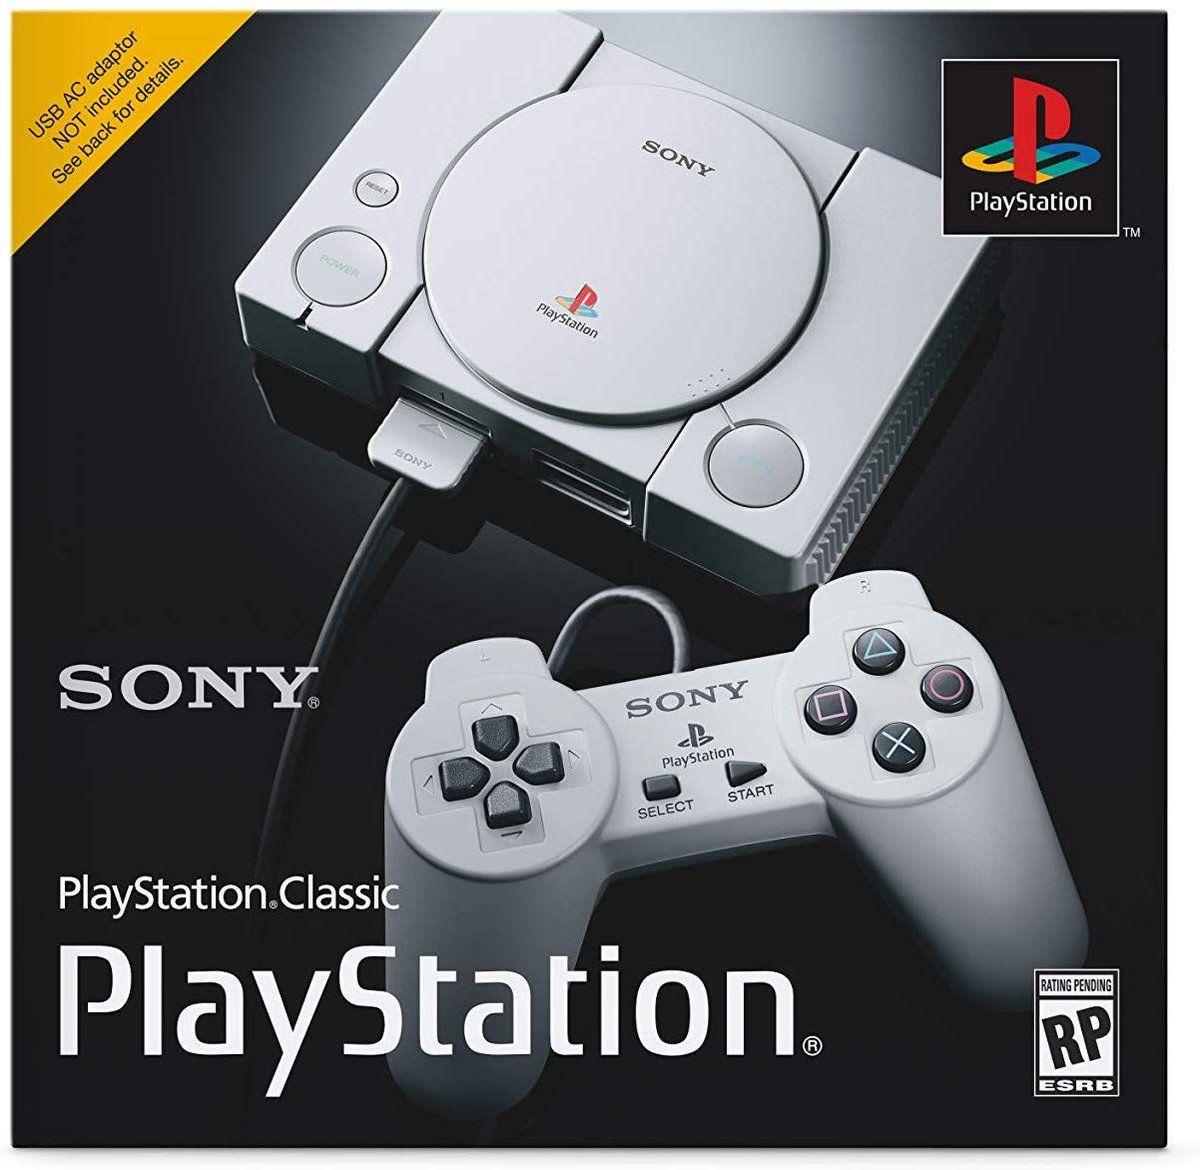 RT @FatKidDeals: PlayStation Classic $29.99  https://t.co/RhCr7bwZc2 https://t.co/dcfd4LtZFd